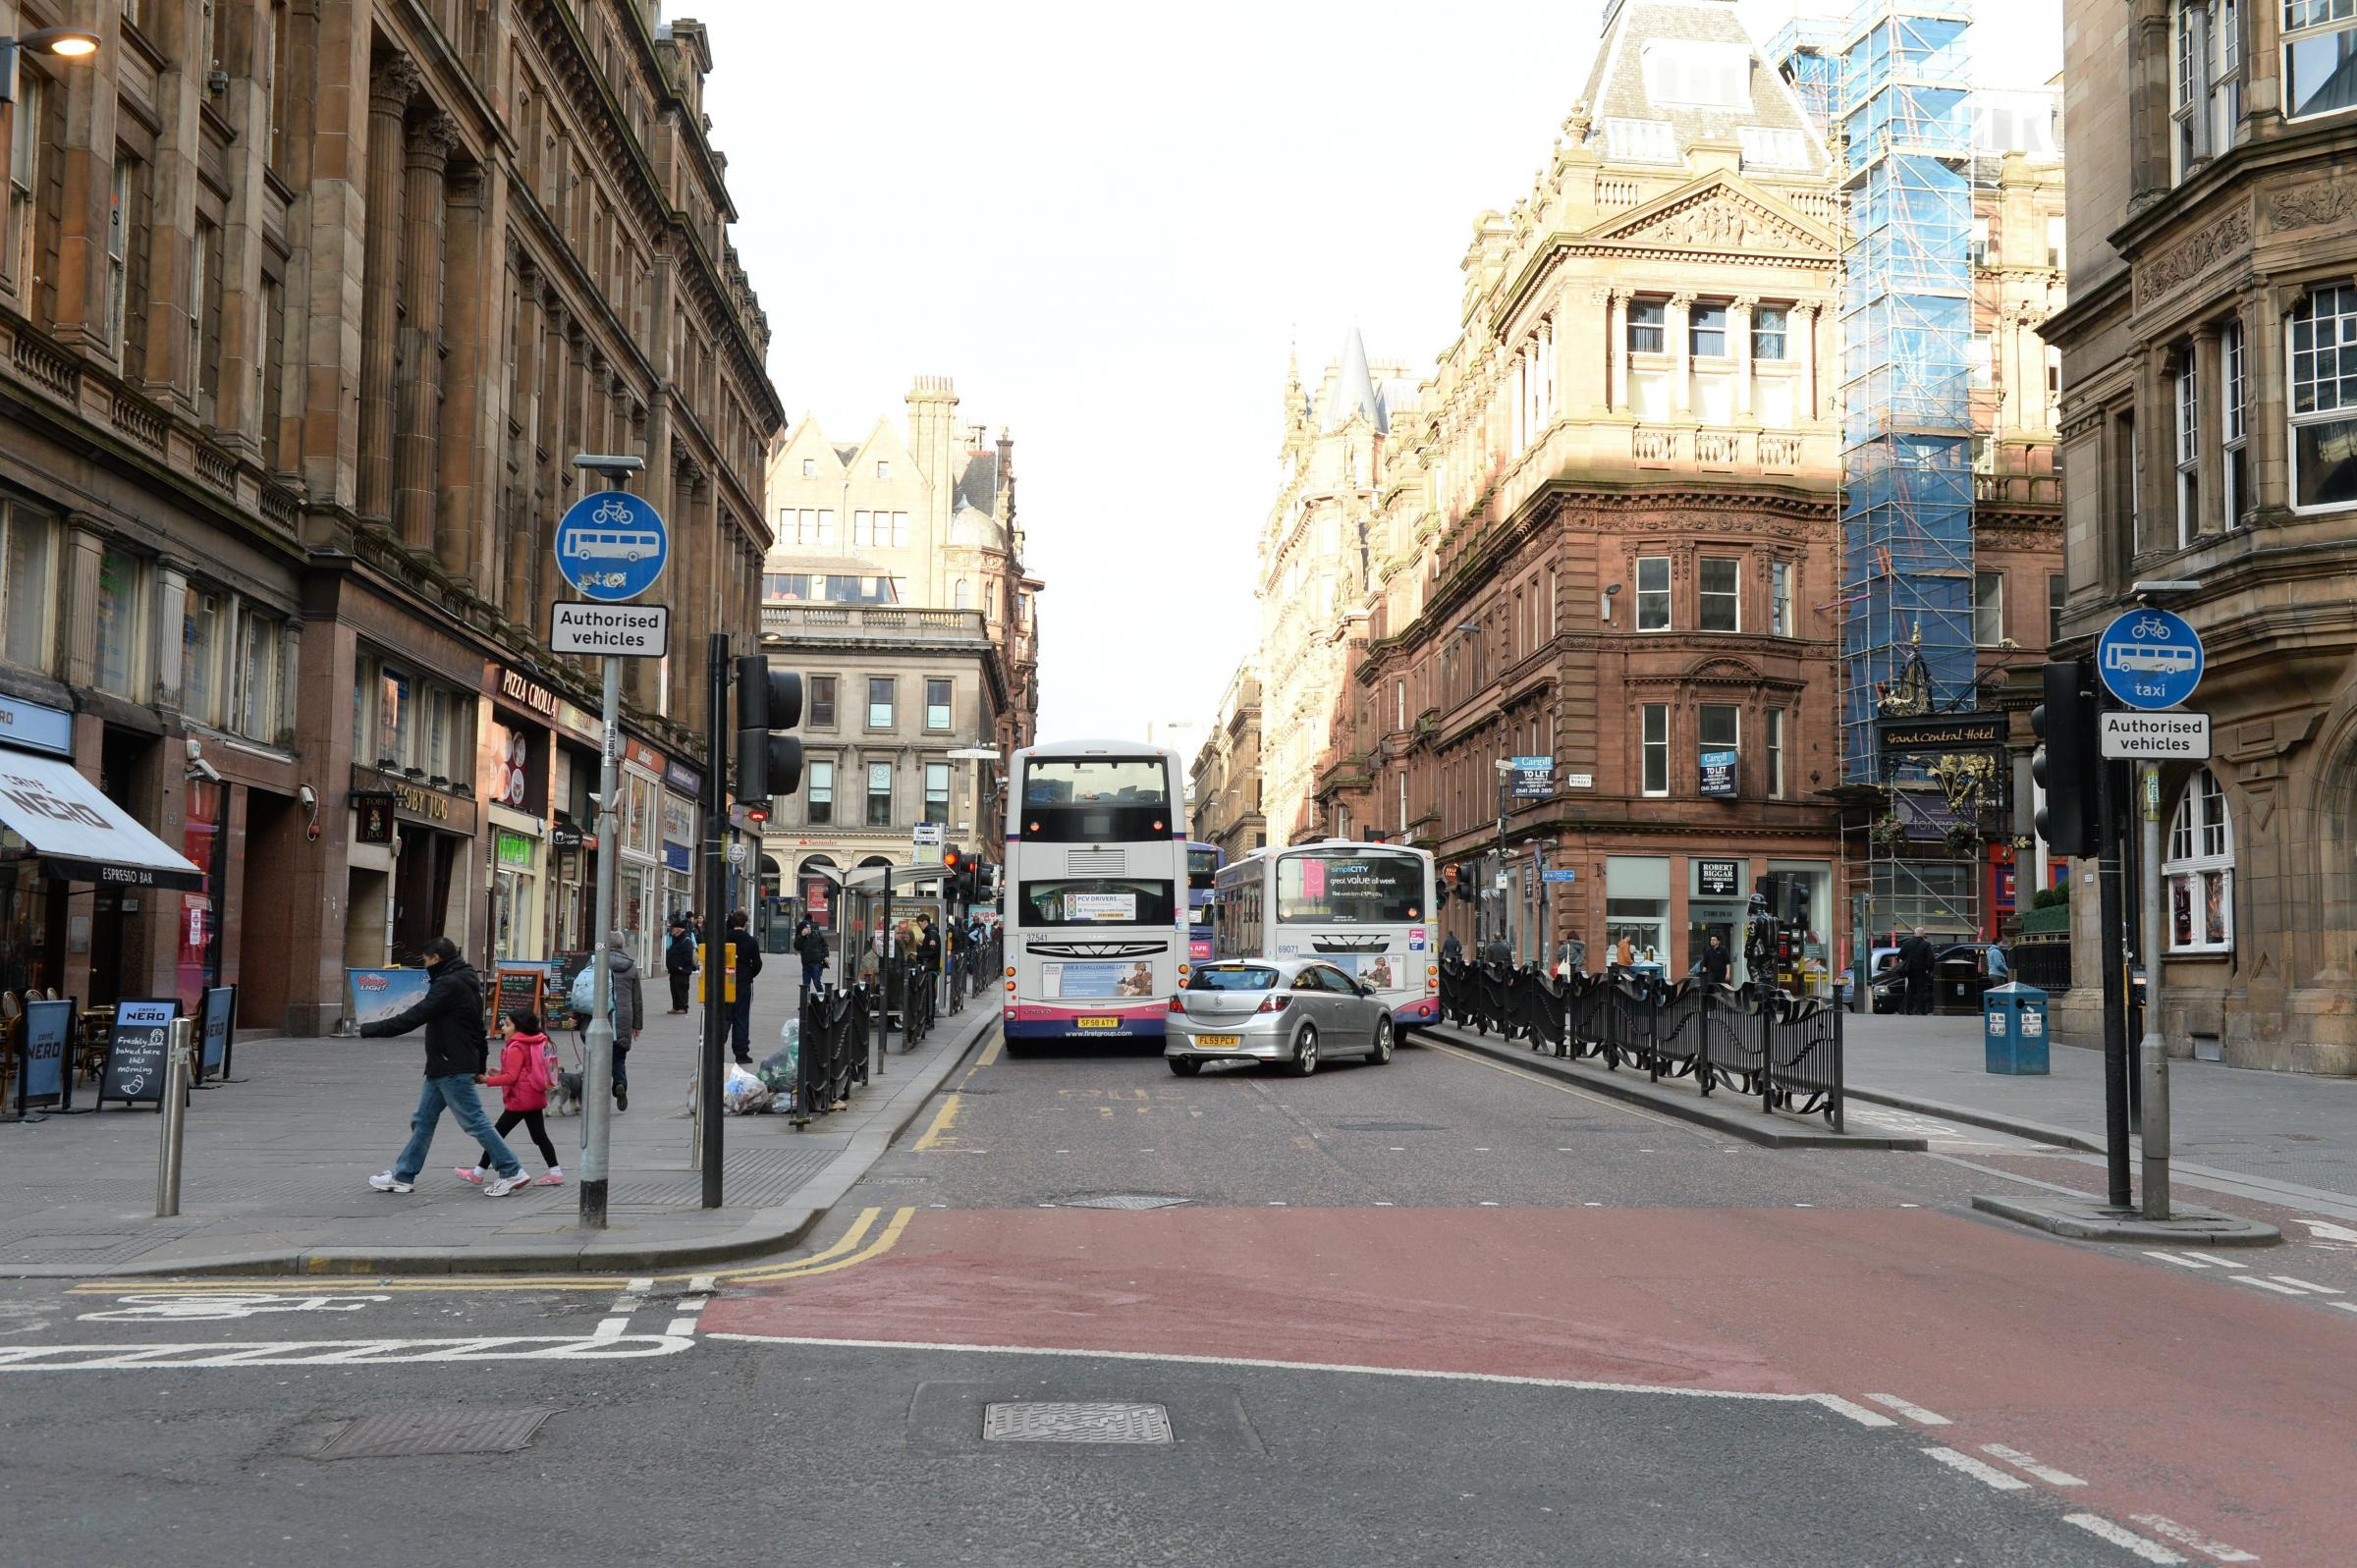 Glasgow takes top spot in bus lane fines